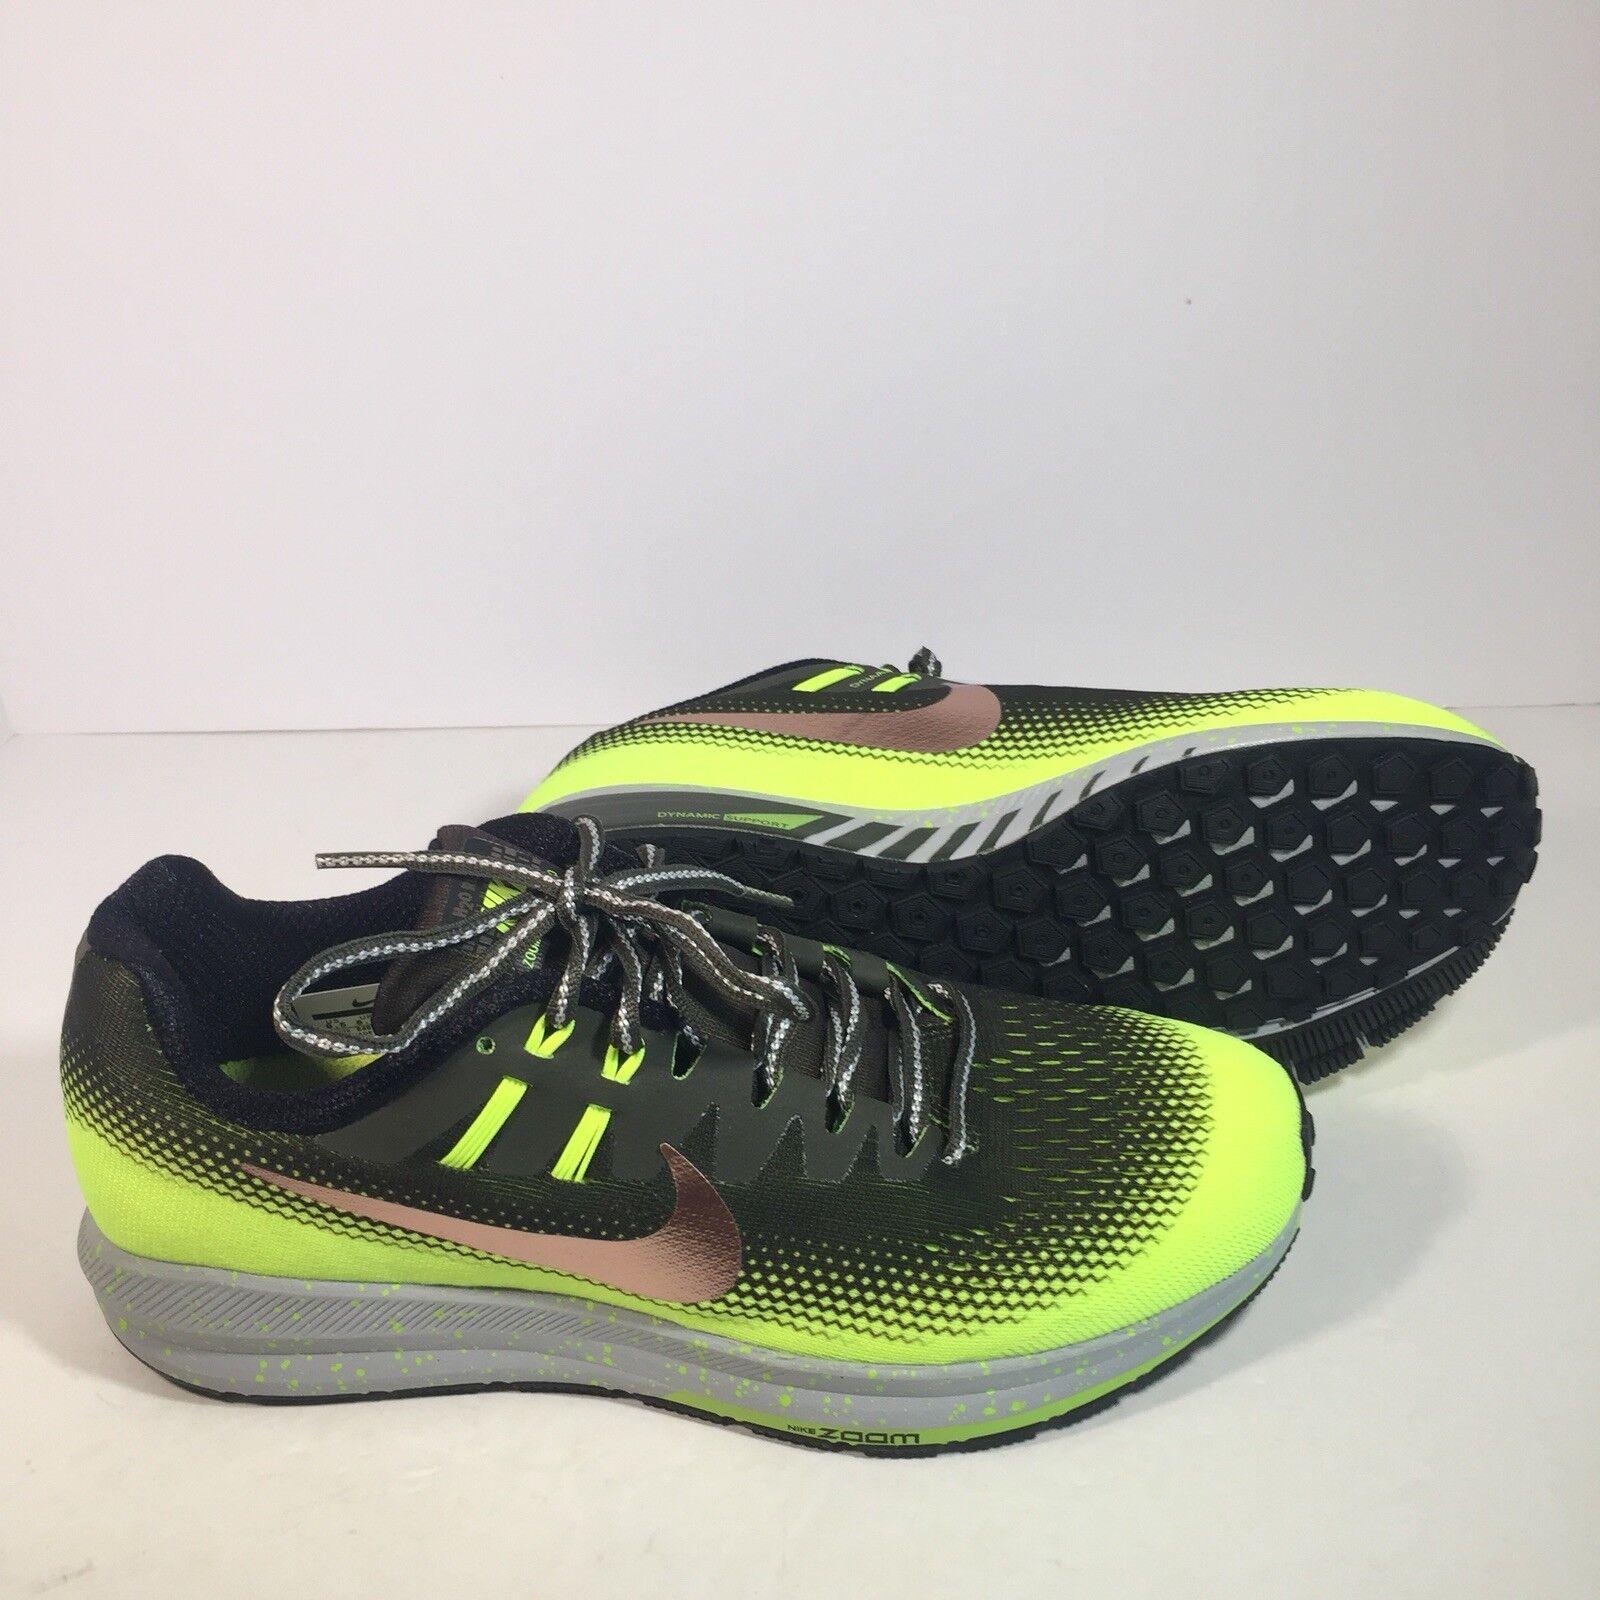 Nike Mens Air Zoom Zoom Zoom Structure 20 Shield Running Khaki Bronze Volt S 14 849581-300 db4c9d